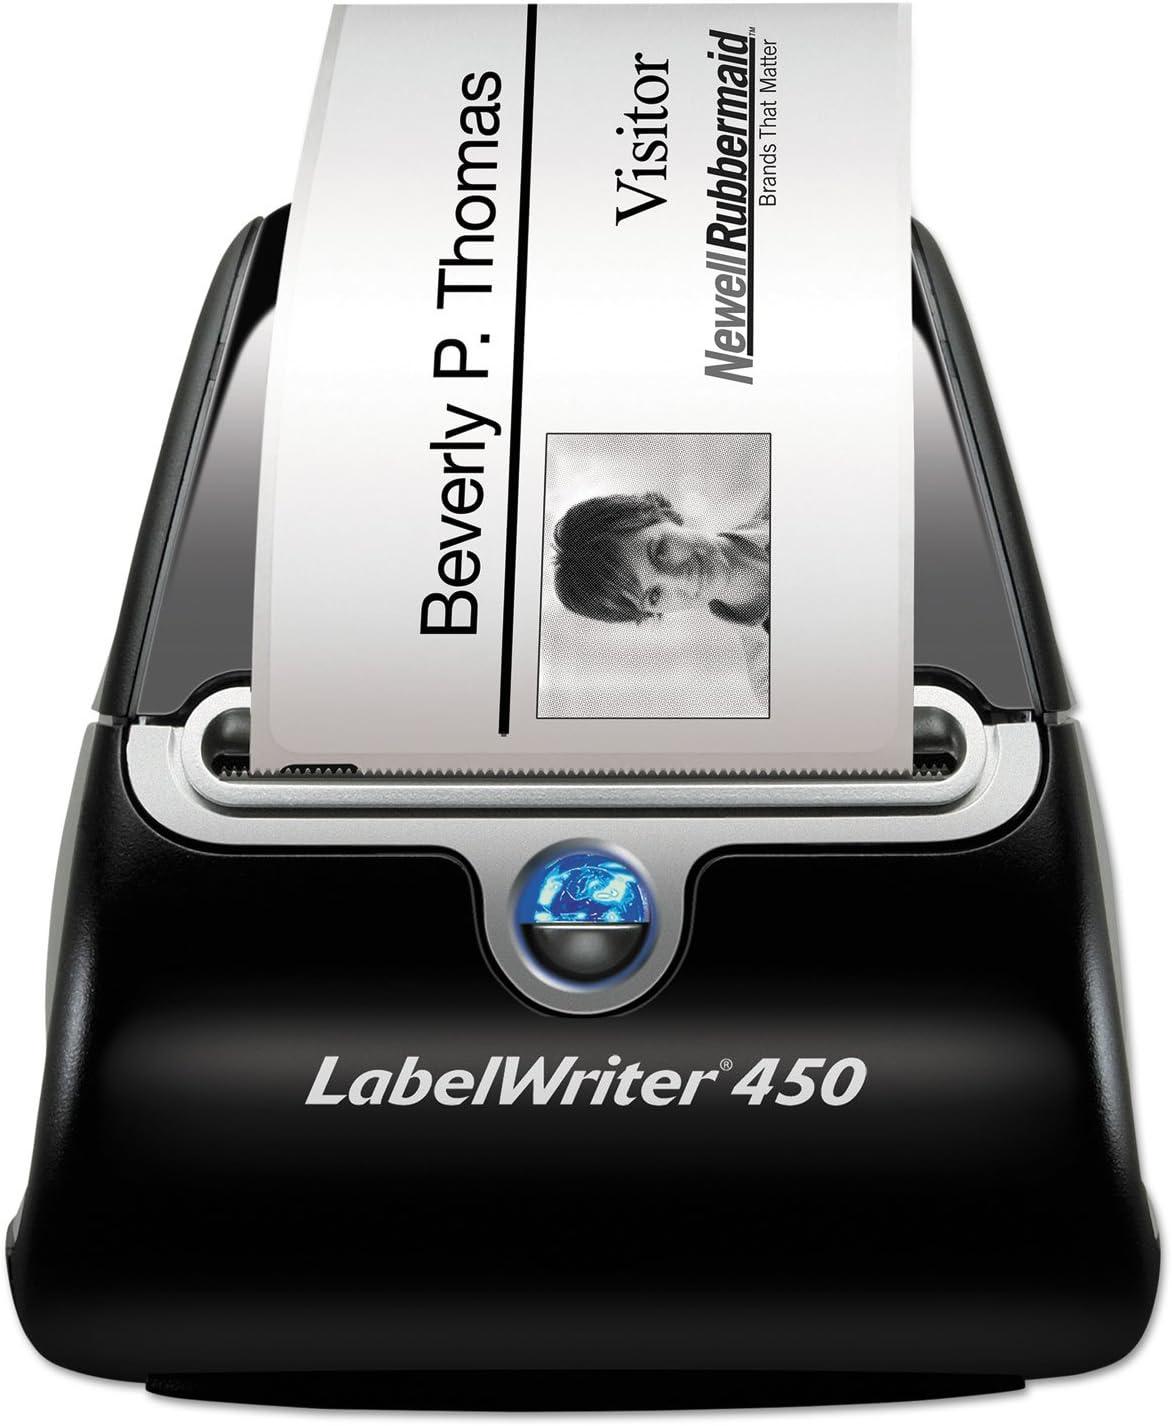 5w x 7 2//5d x 5 1//5h DYMO 1752264 LabelWriter Printer 2 3//10-Inch Labels 51 Labels//Min